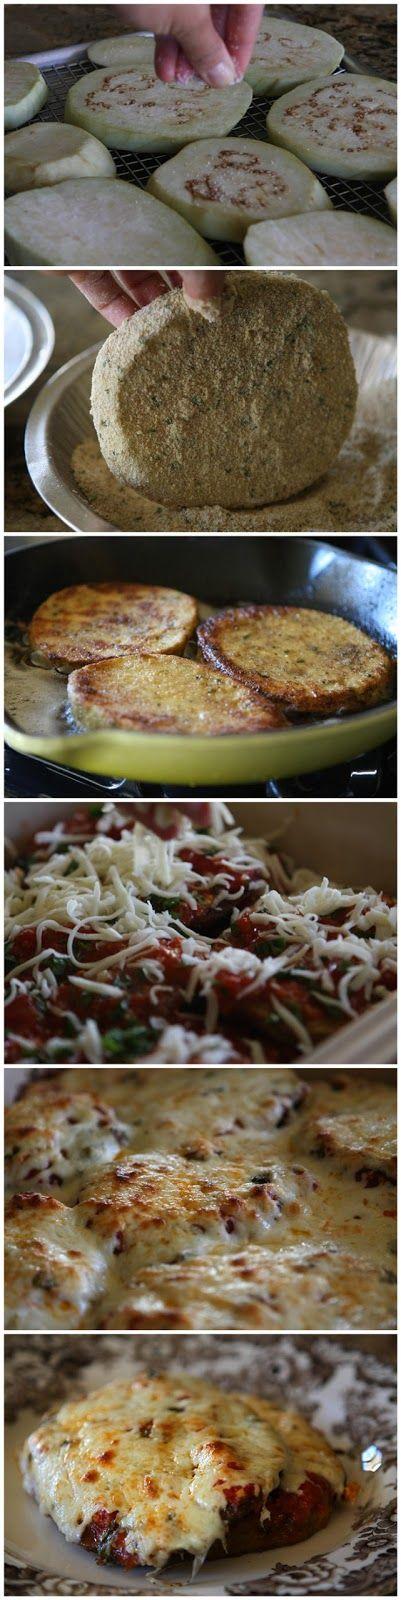 Eggplant Parmesan. Love this